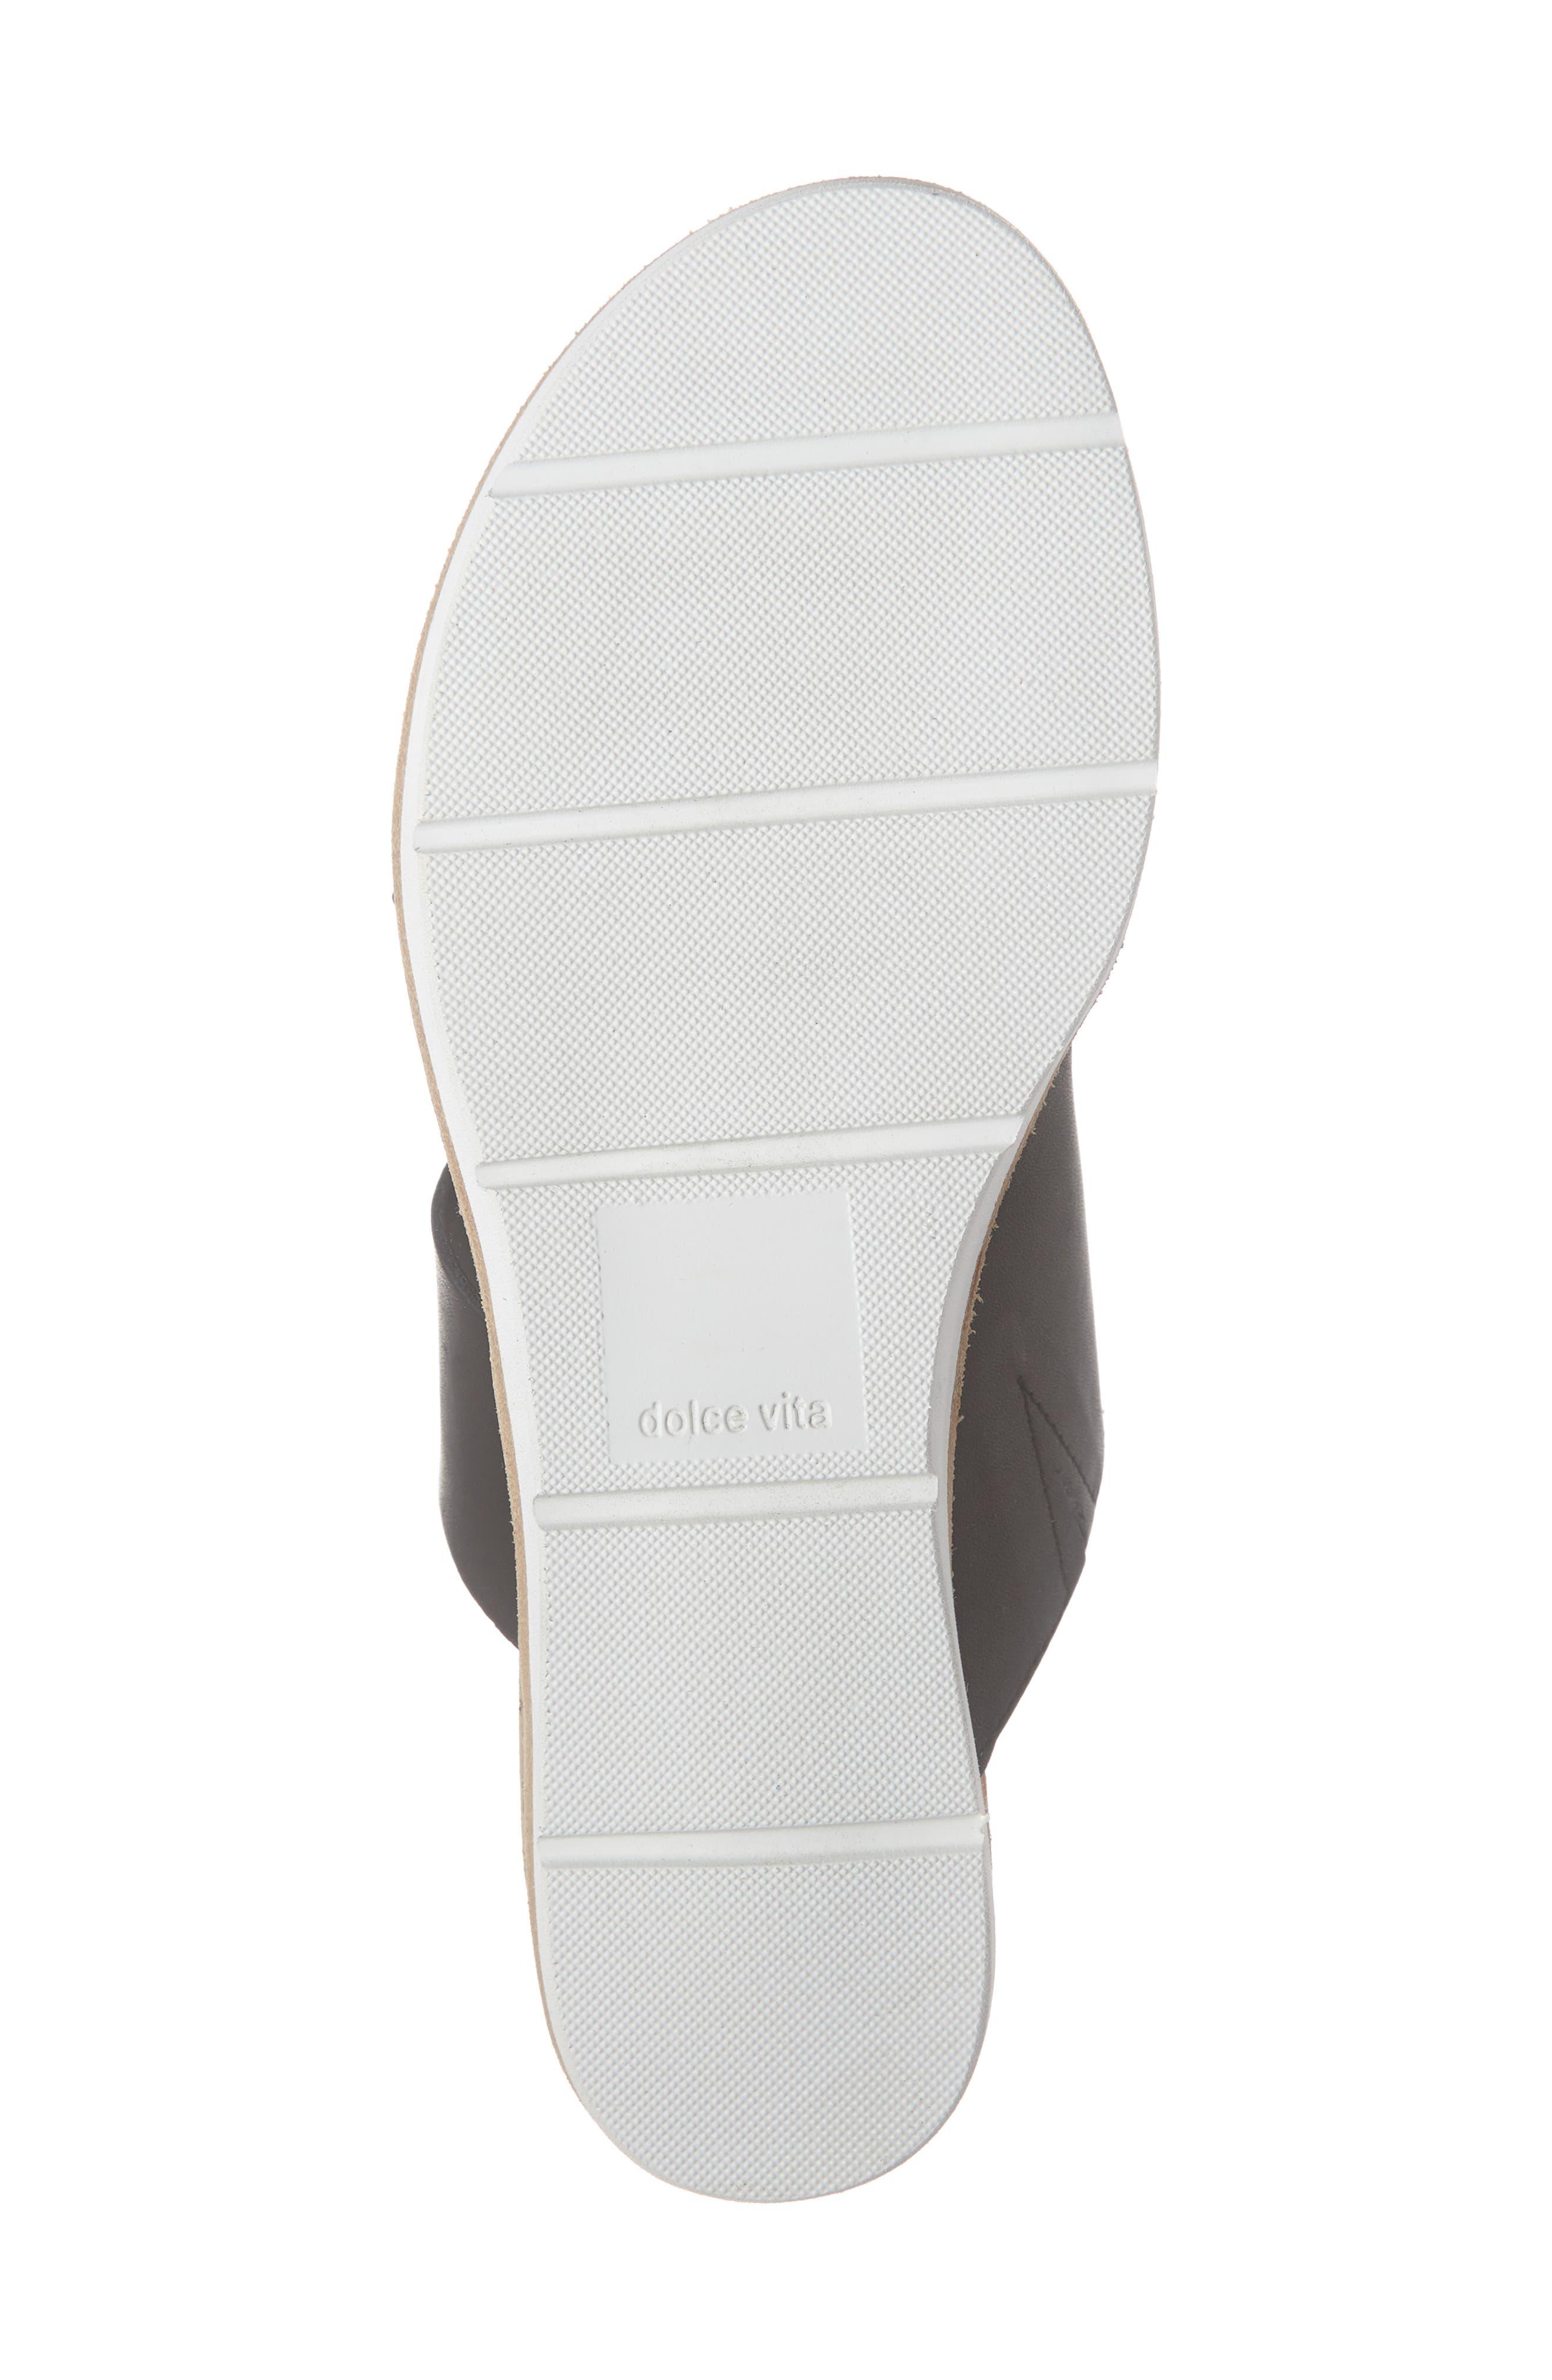 DOLCE VITA, Vala Wedge Slide Sandal, Alternate thumbnail 6, color, BLACK LEATHER